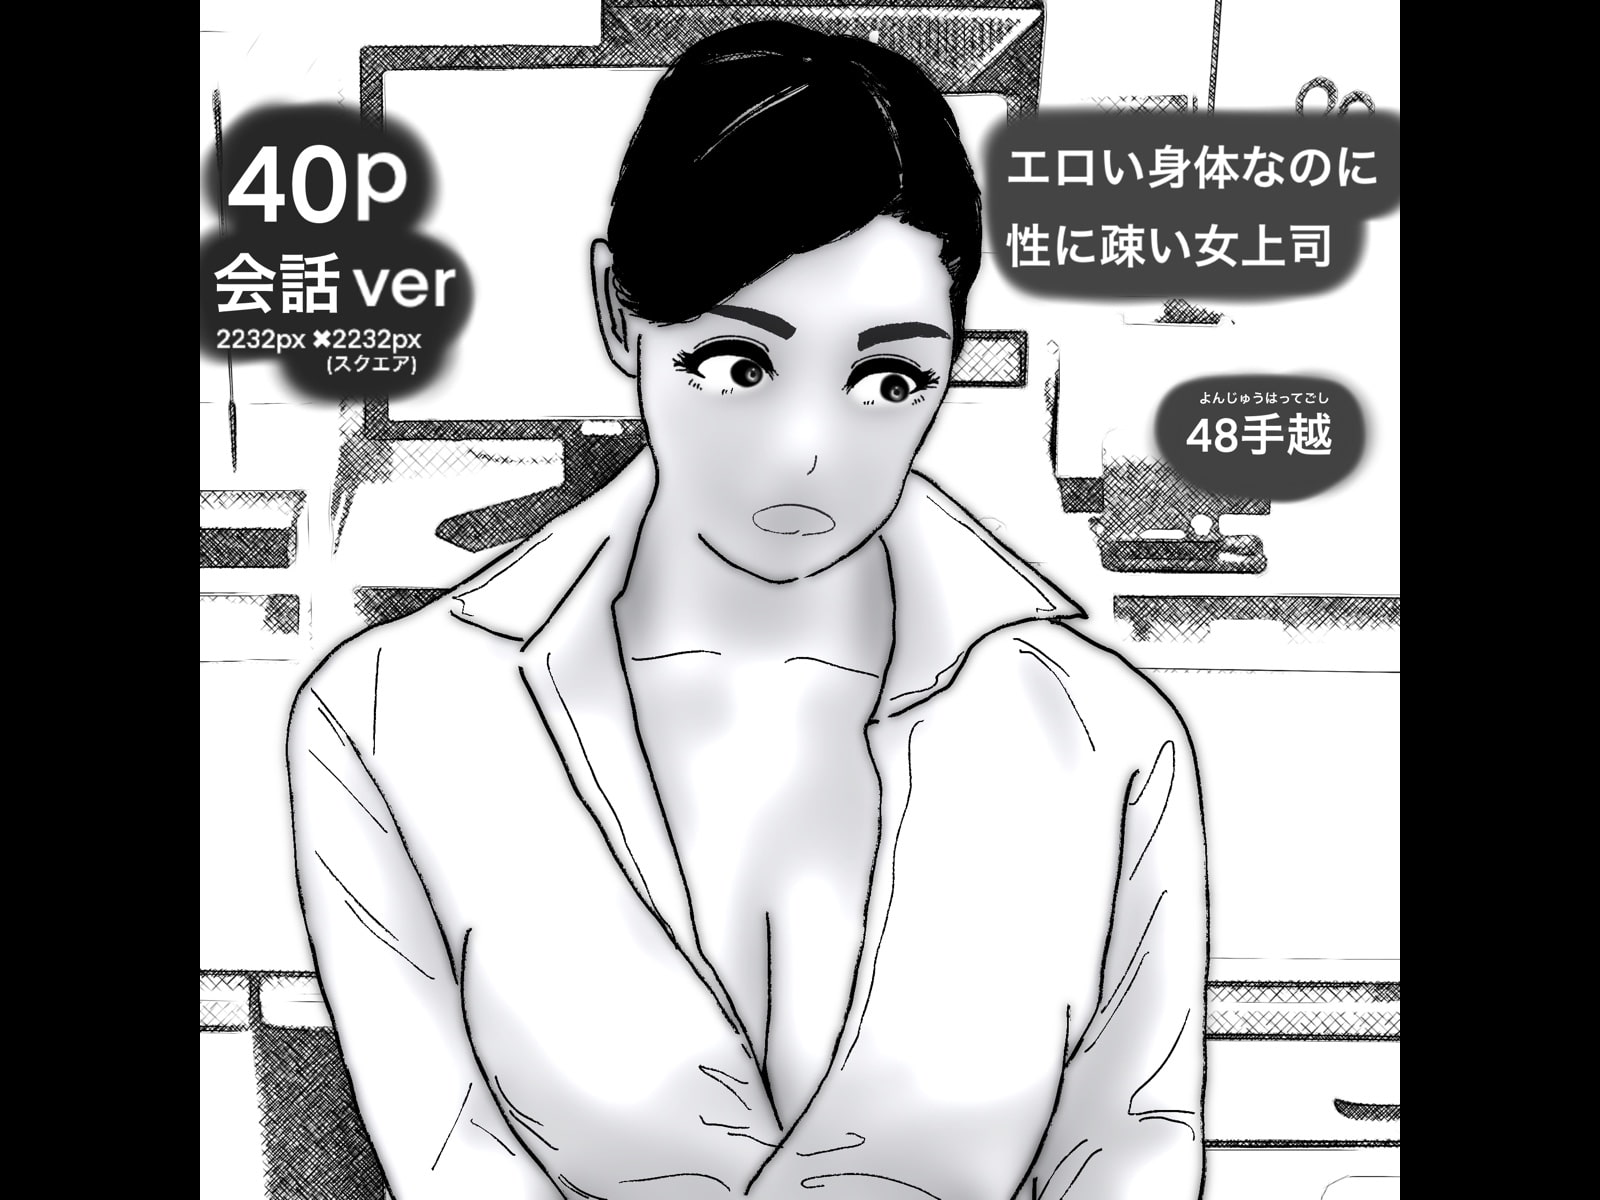 40pエロい身体なのに性に疎い女上司